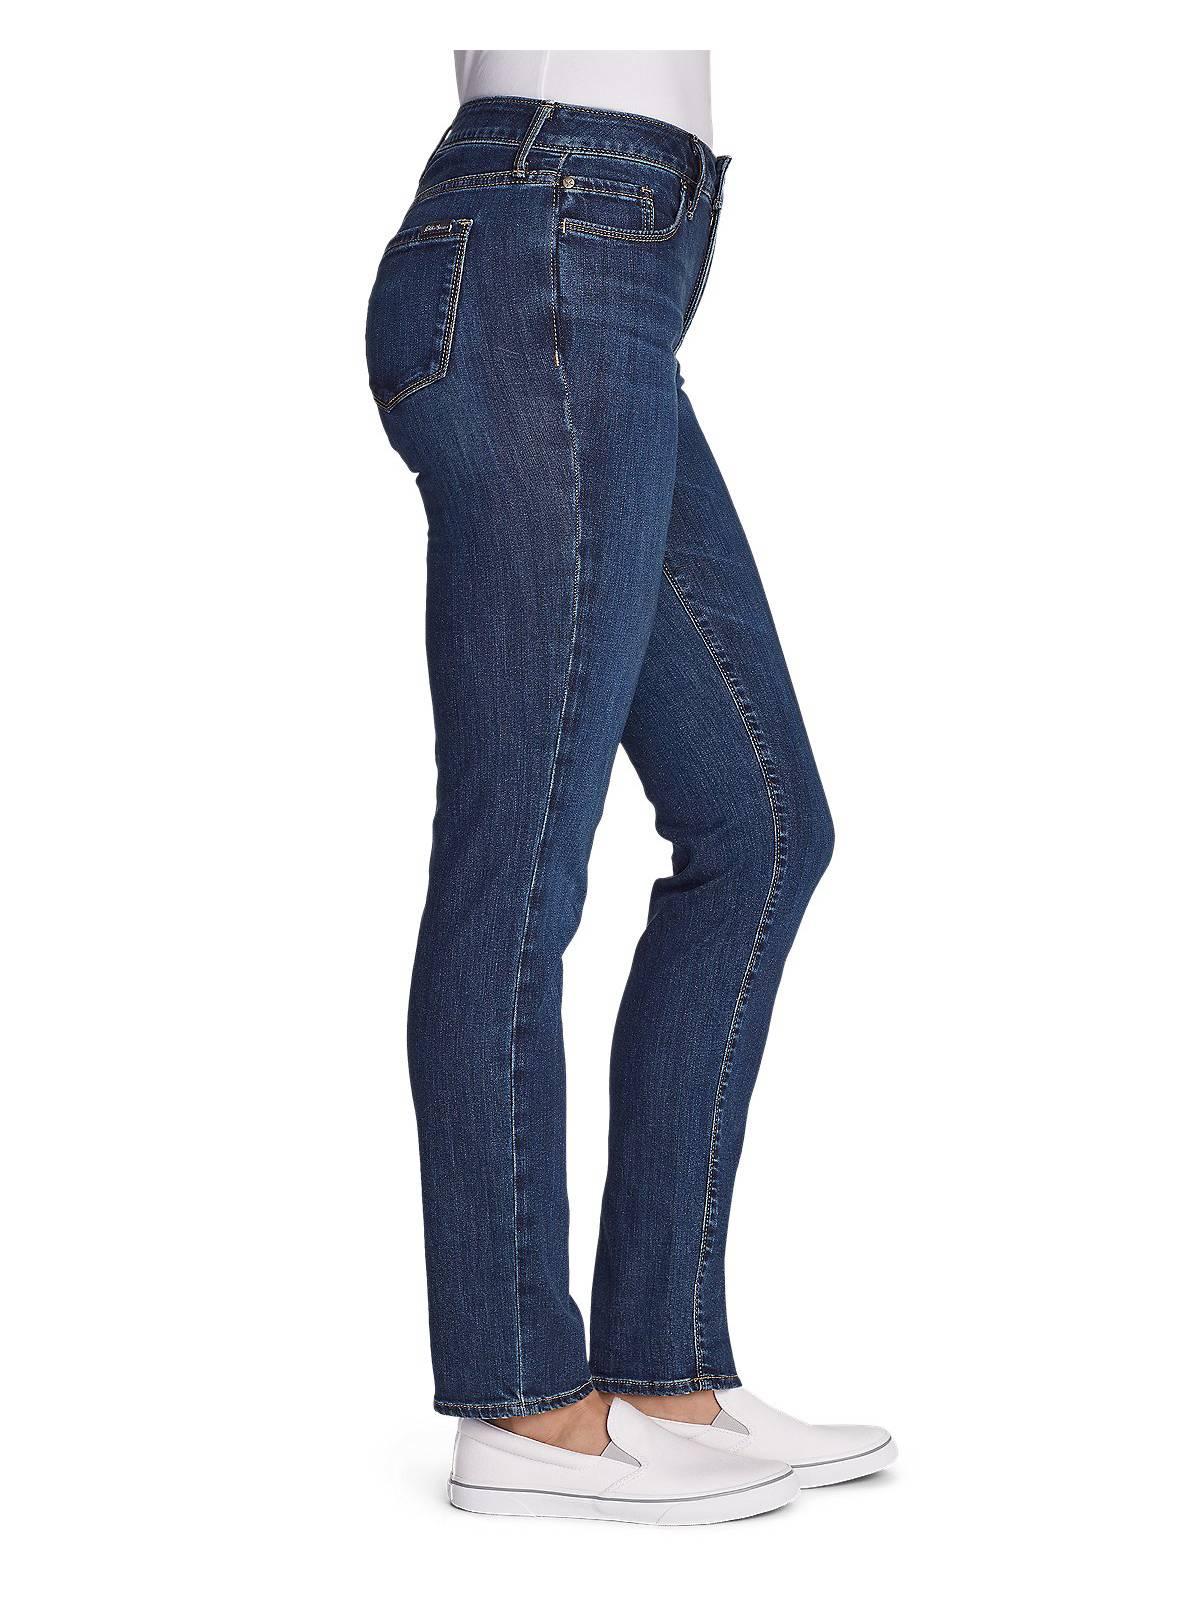 Eddie-Bauer-Women-039-s-Elysian-Slim-Straight-High-Rise-Jeans thumbnail 4